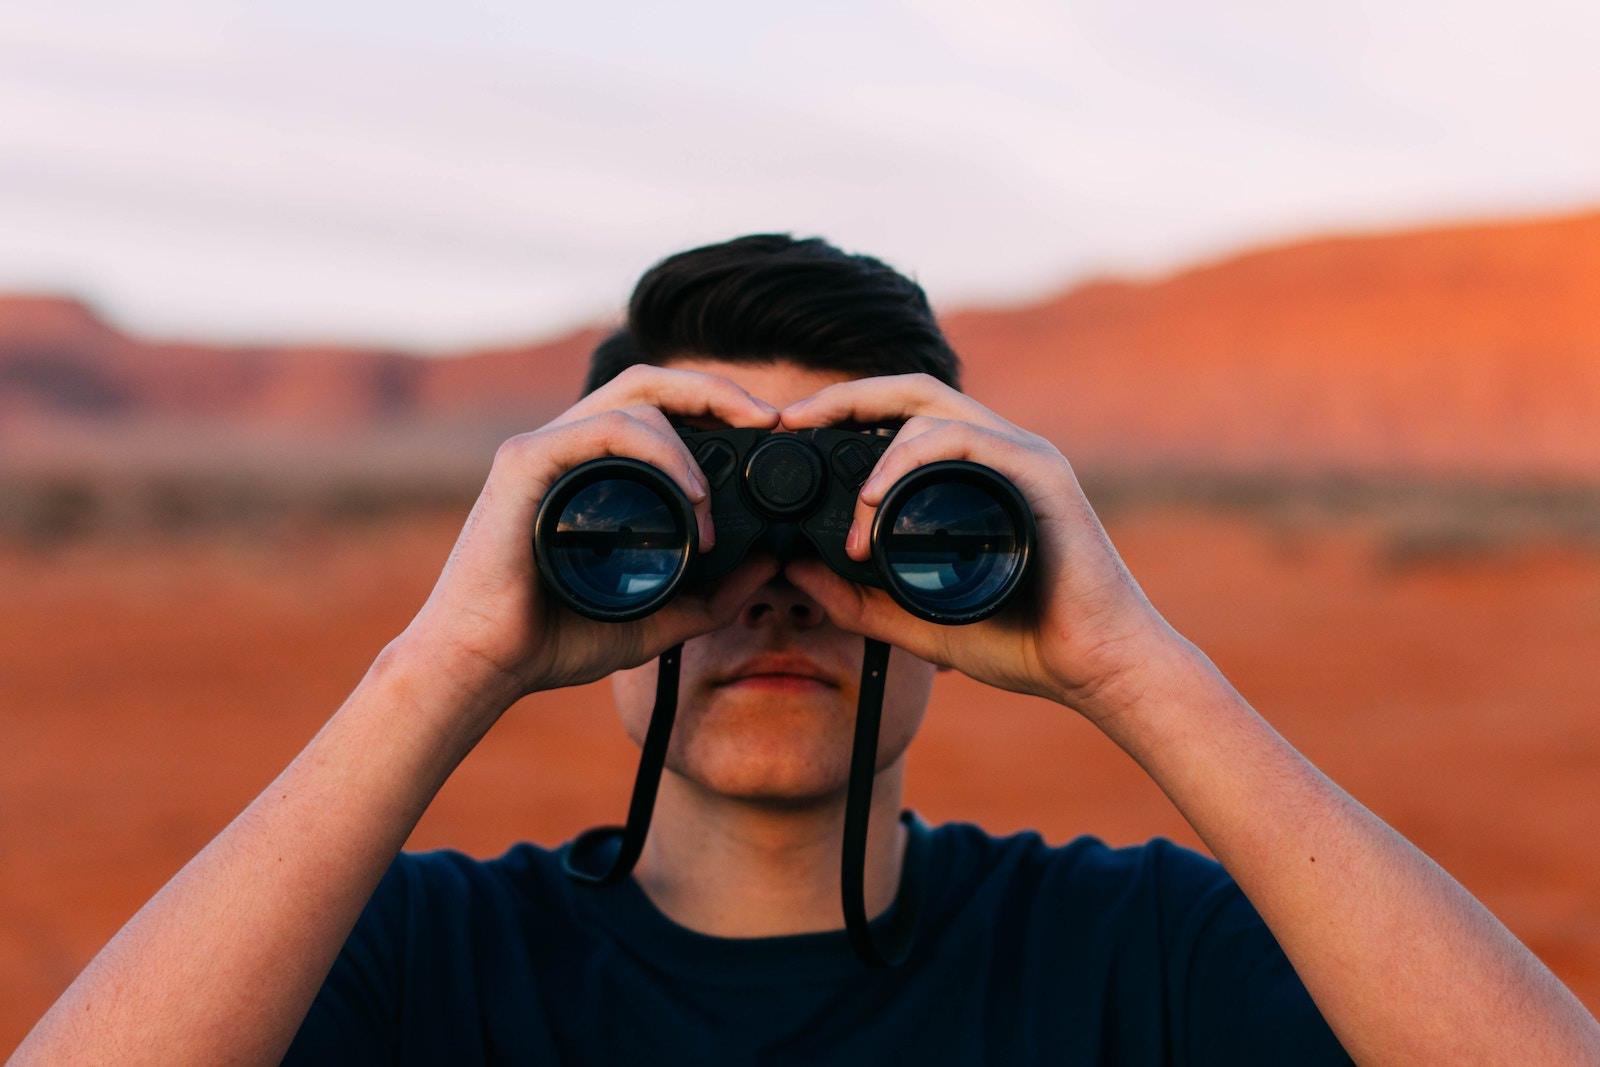 evan-kirby-65496-unsplash-binoculars